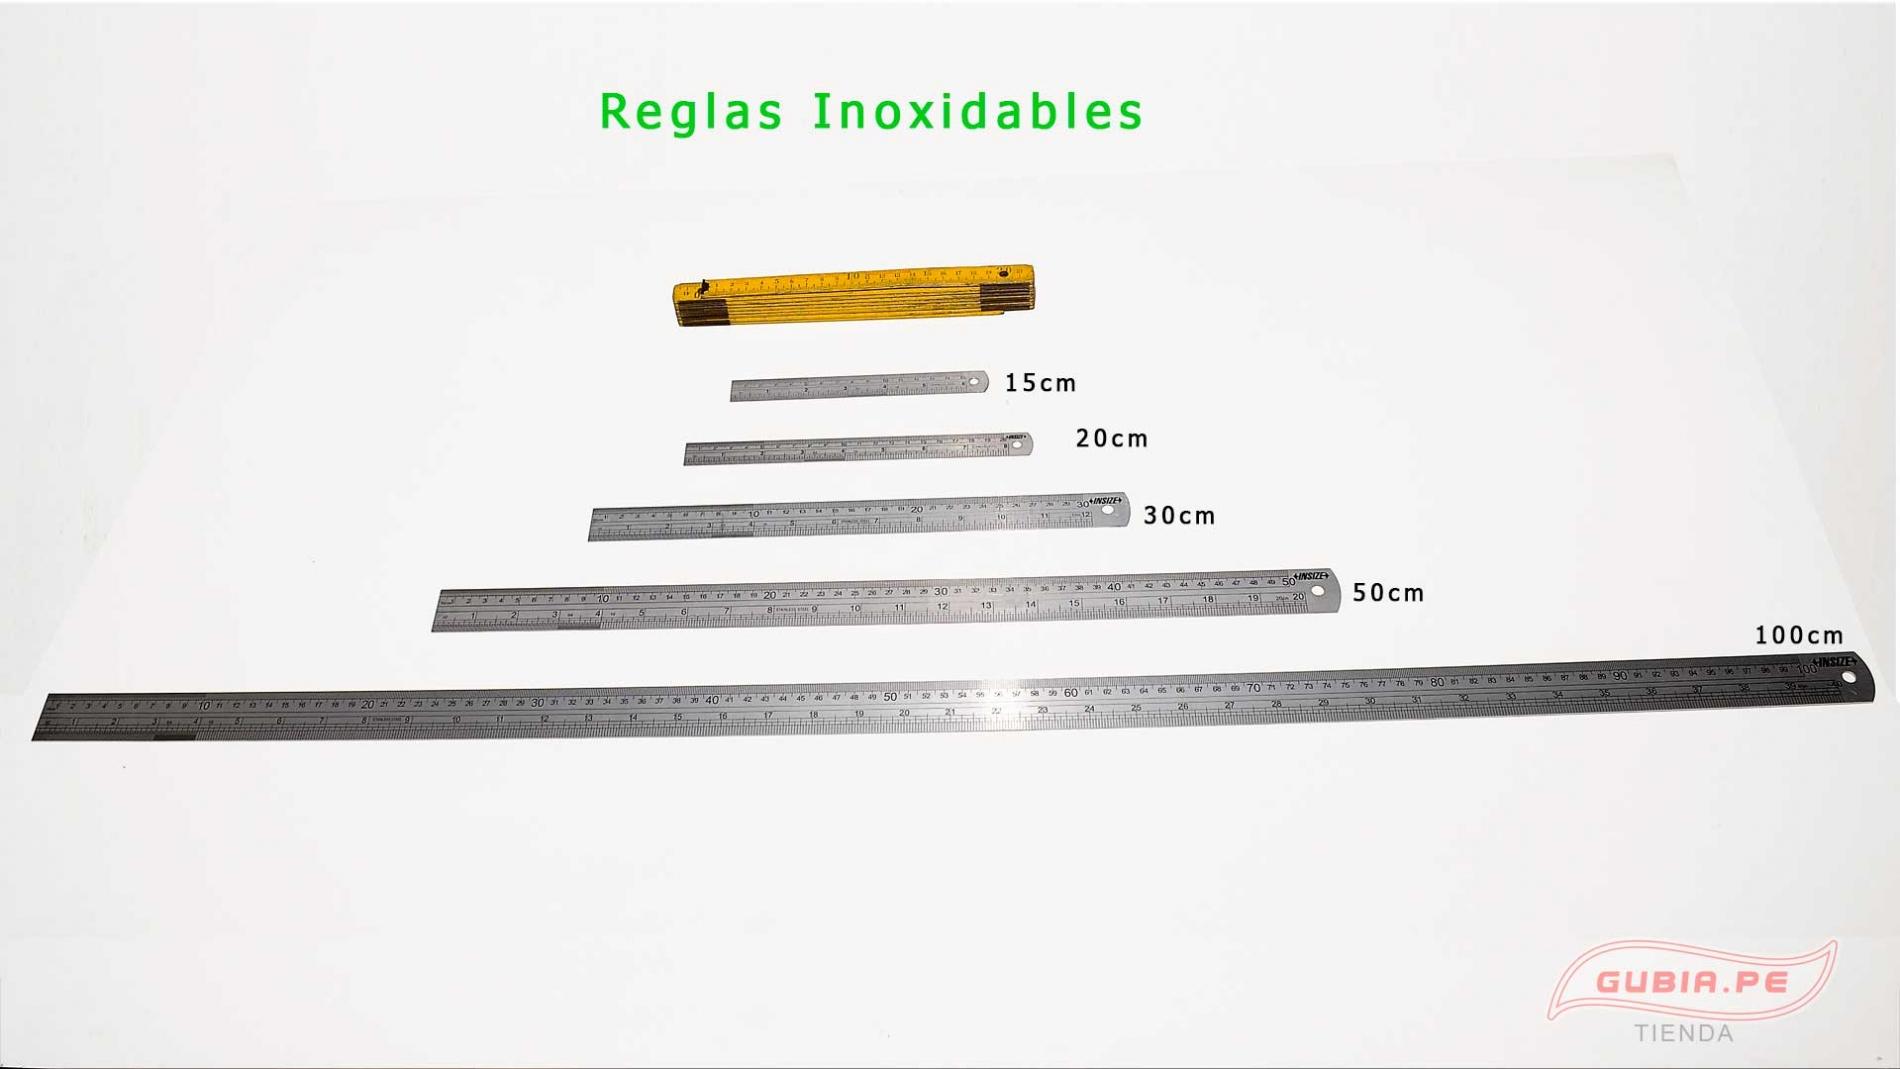 7110-200-Regla inoxidable 200mm Insize 7110-200-max-3.